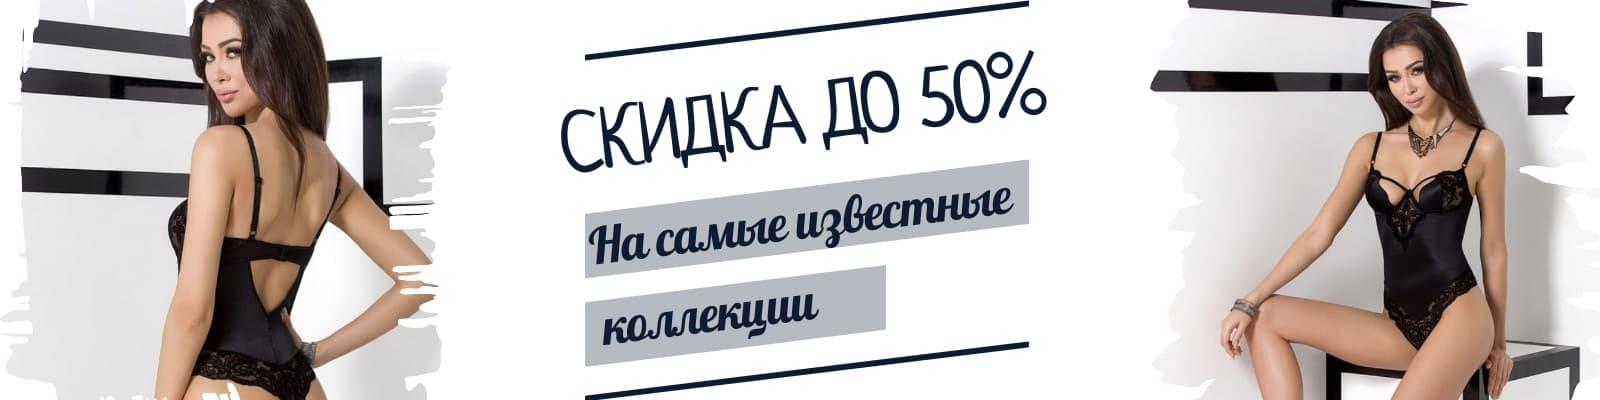 1343154360_25